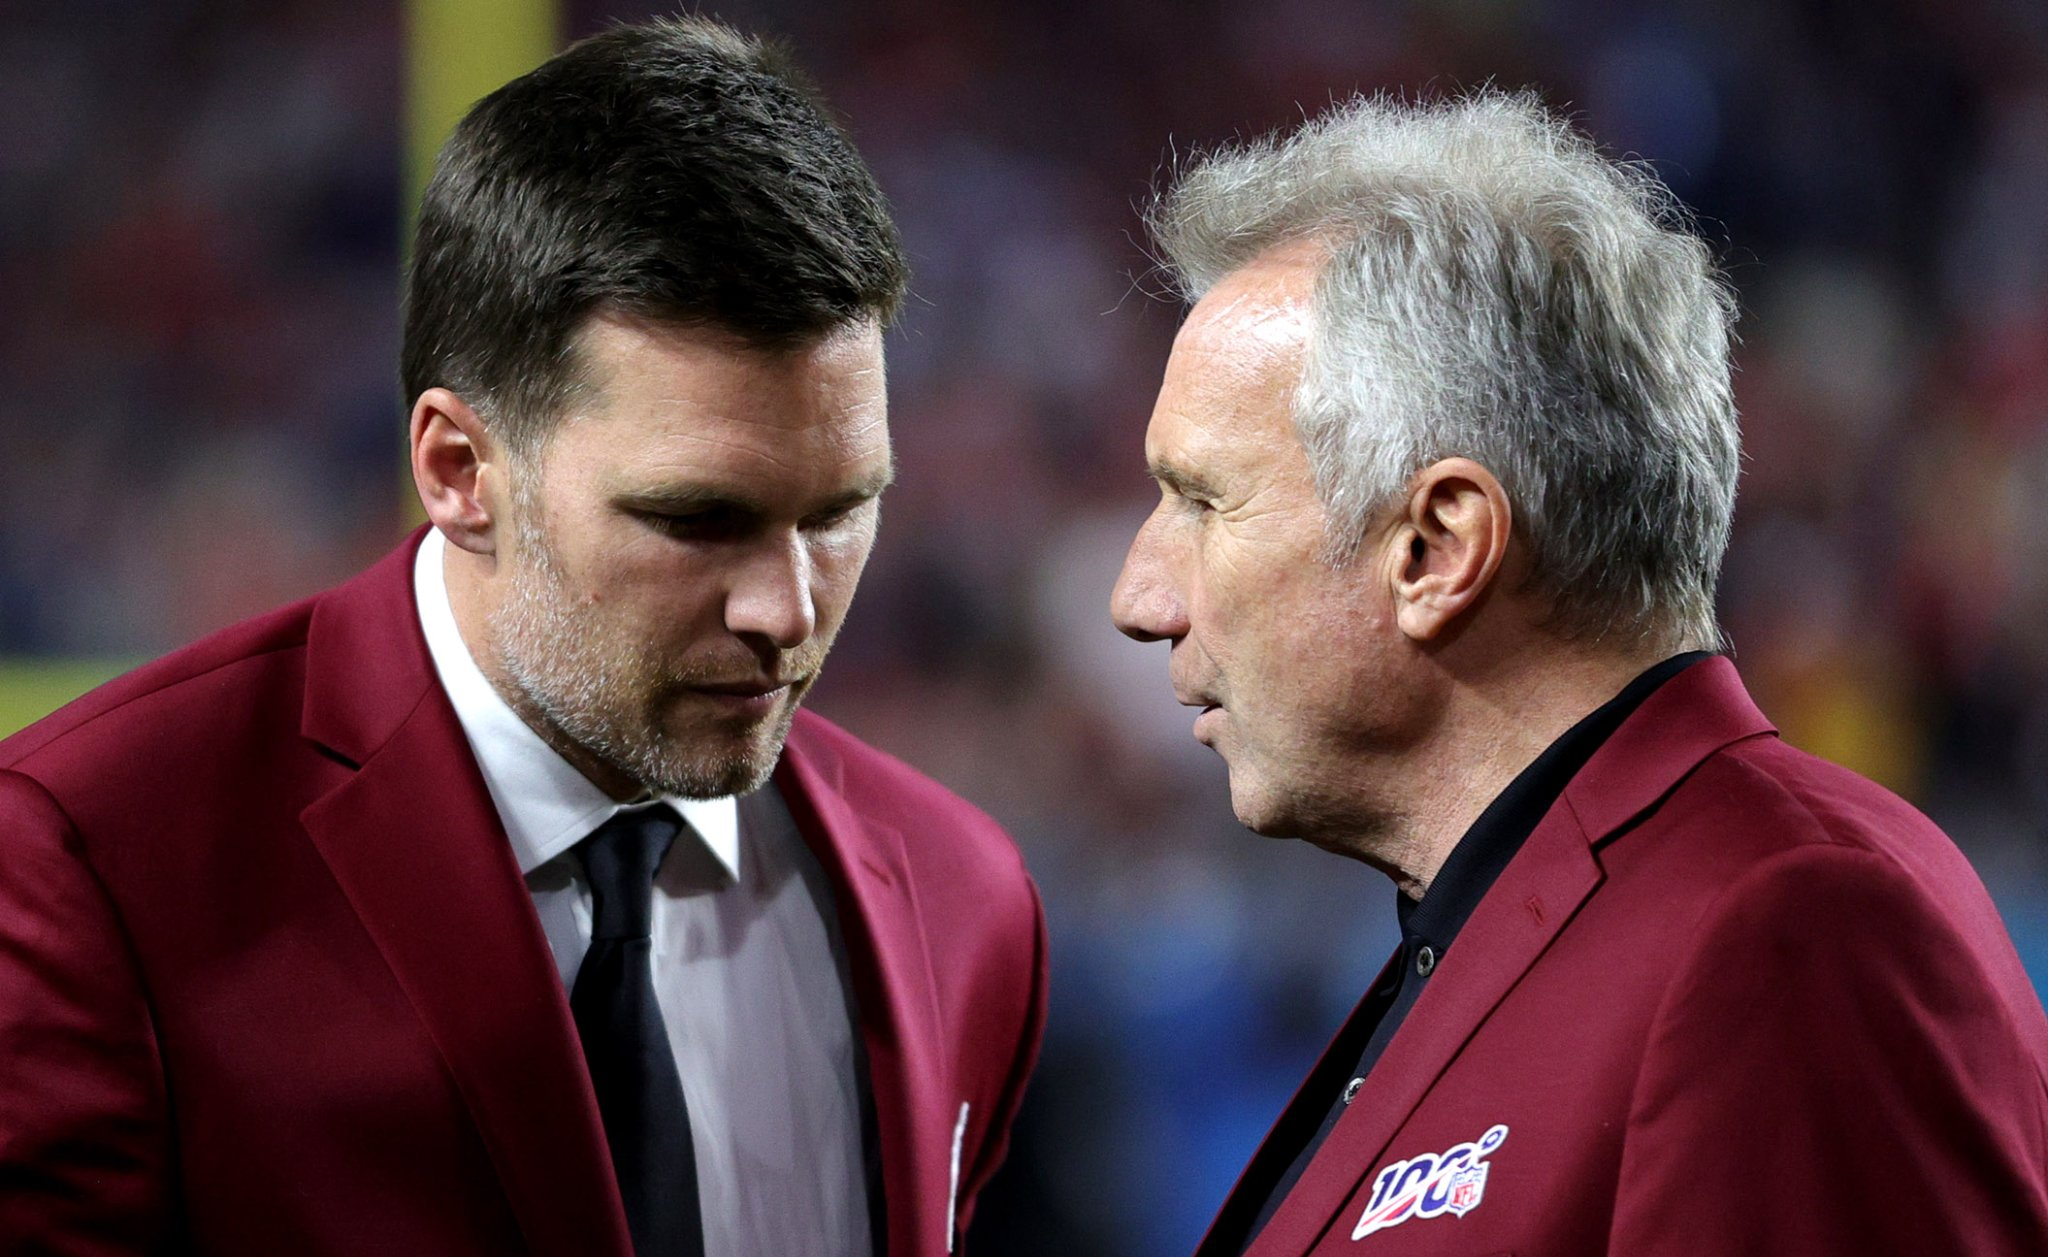 Joe Montana Reveals Why He Thinks Tom Brady Left New England, Based On Conversation At Super Bowl LIV - BroBible